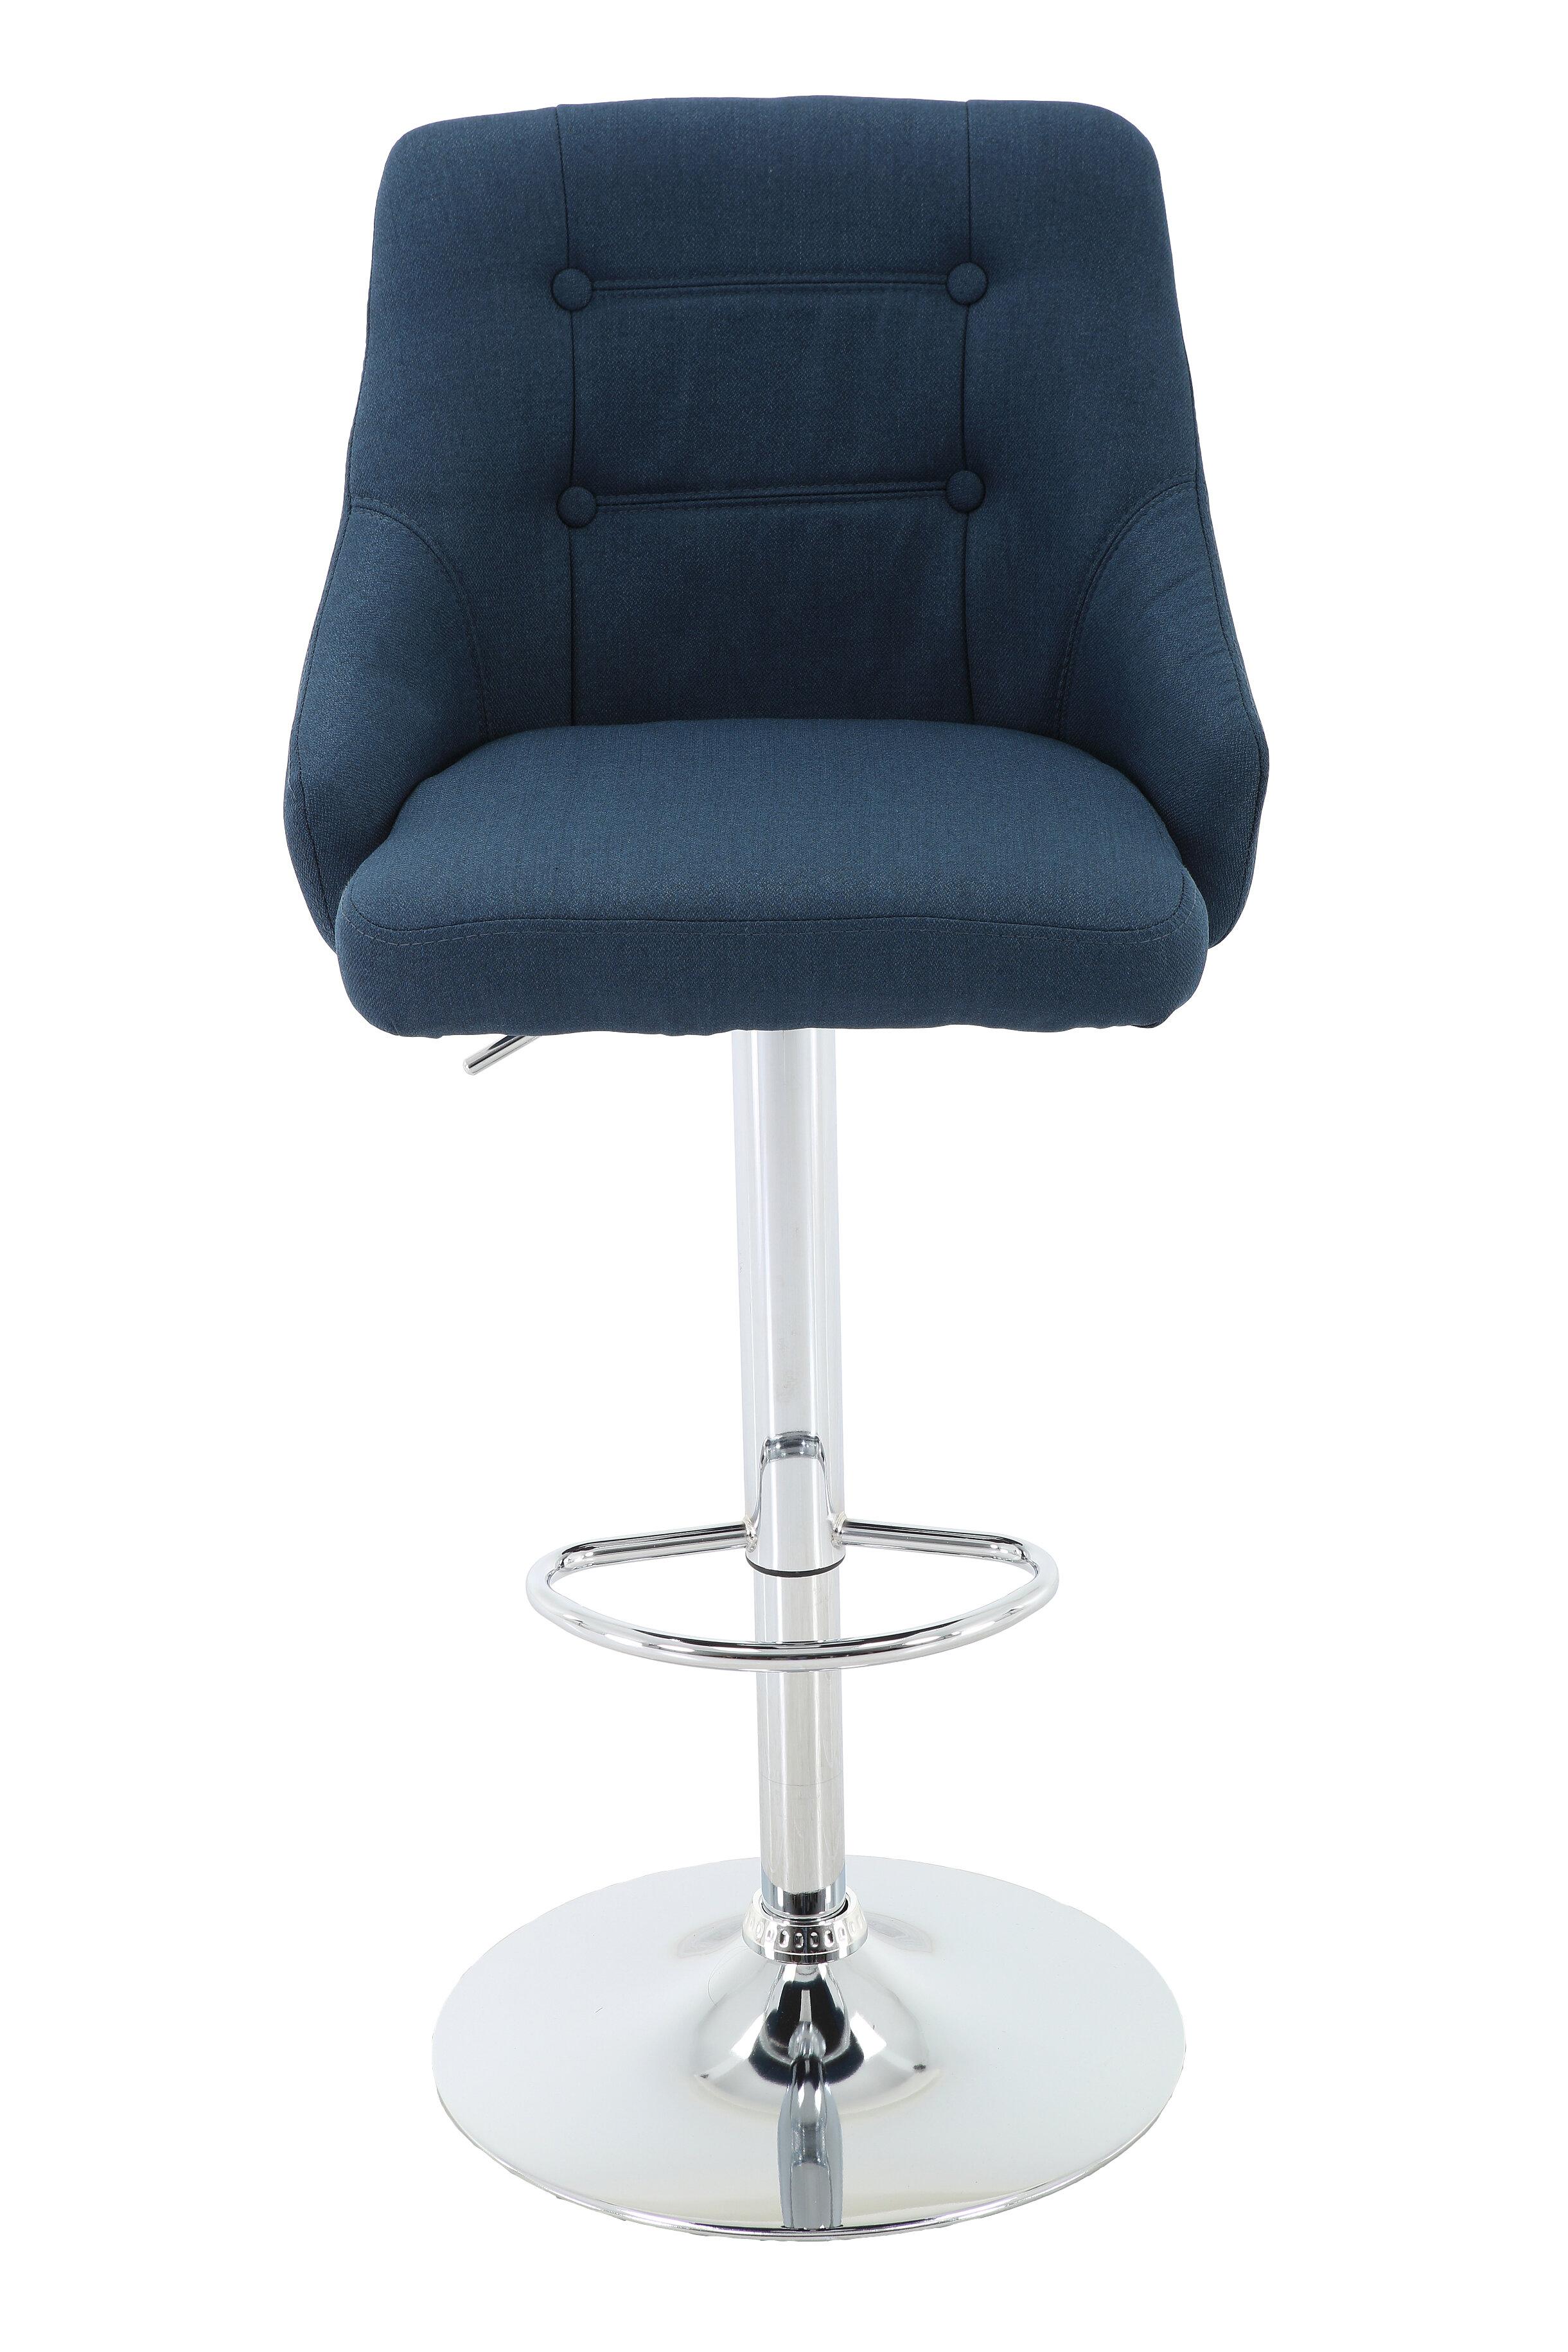 Pleasant Orren Ellis Aadvik Adjustable Height Swivel Bar Stool Wayfair Caraccident5 Cool Chair Designs And Ideas Caraccident5Info